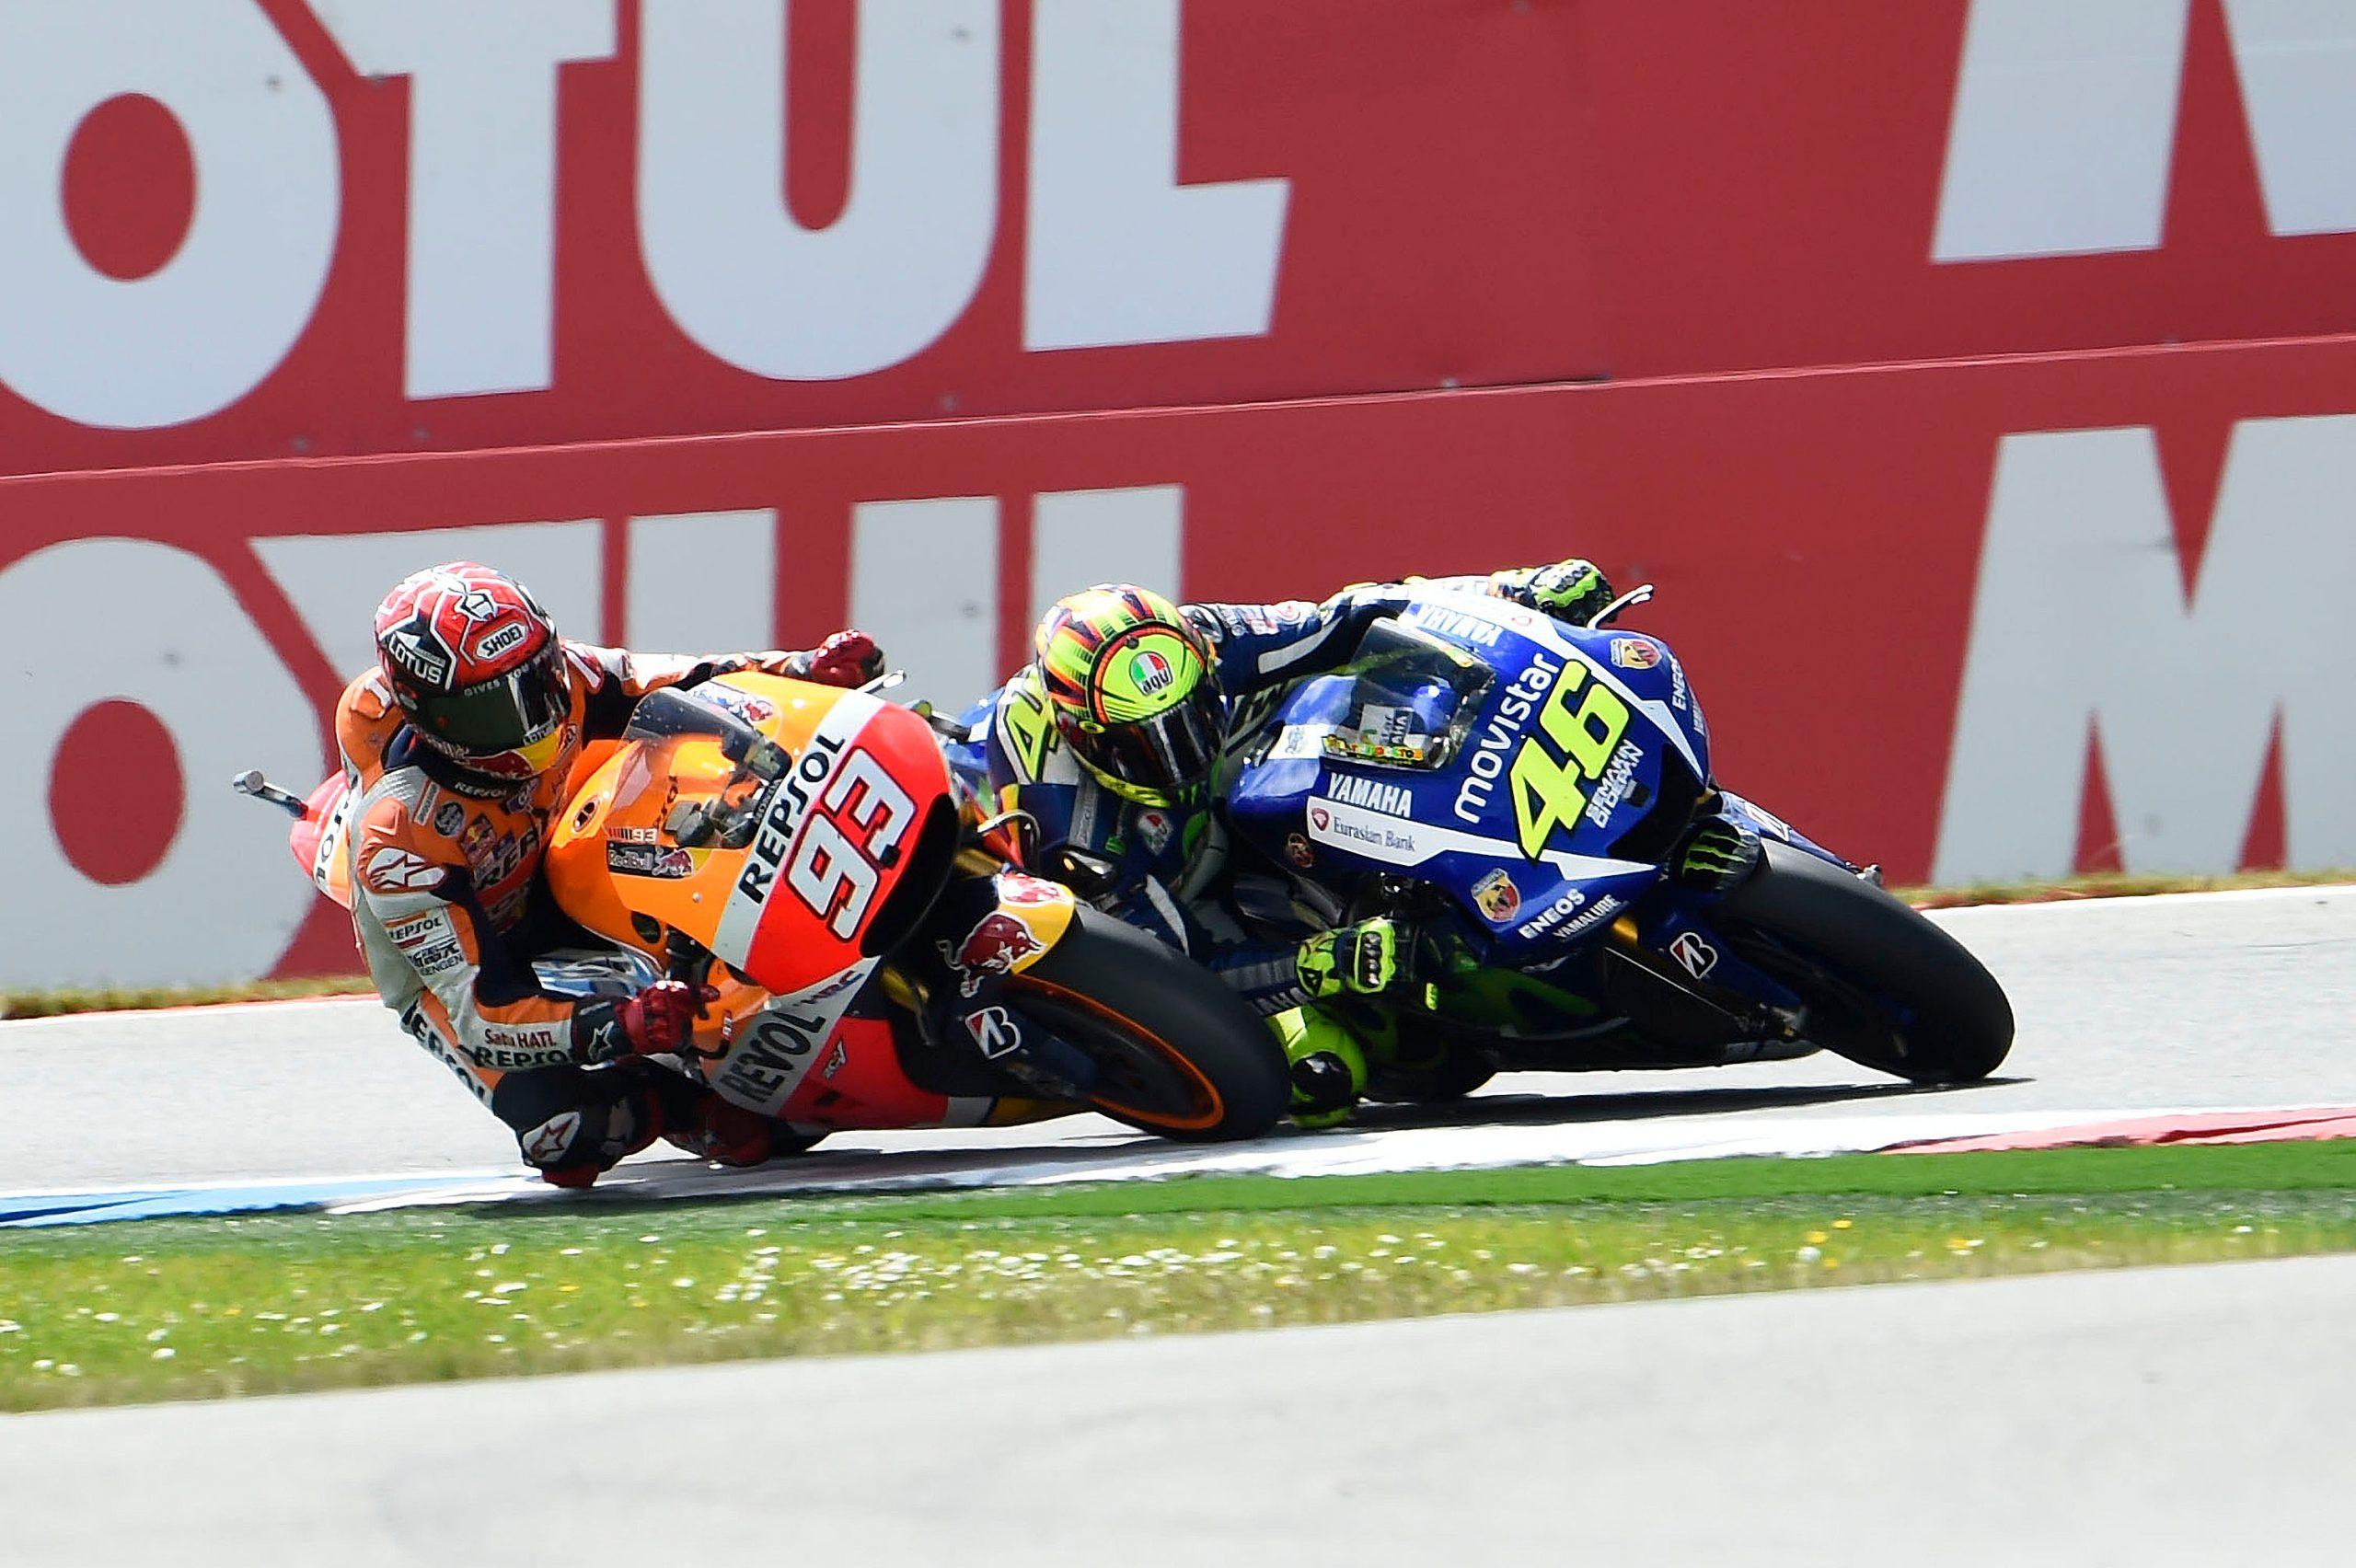 Rossi vs Marquez w Assen w 2015 roku